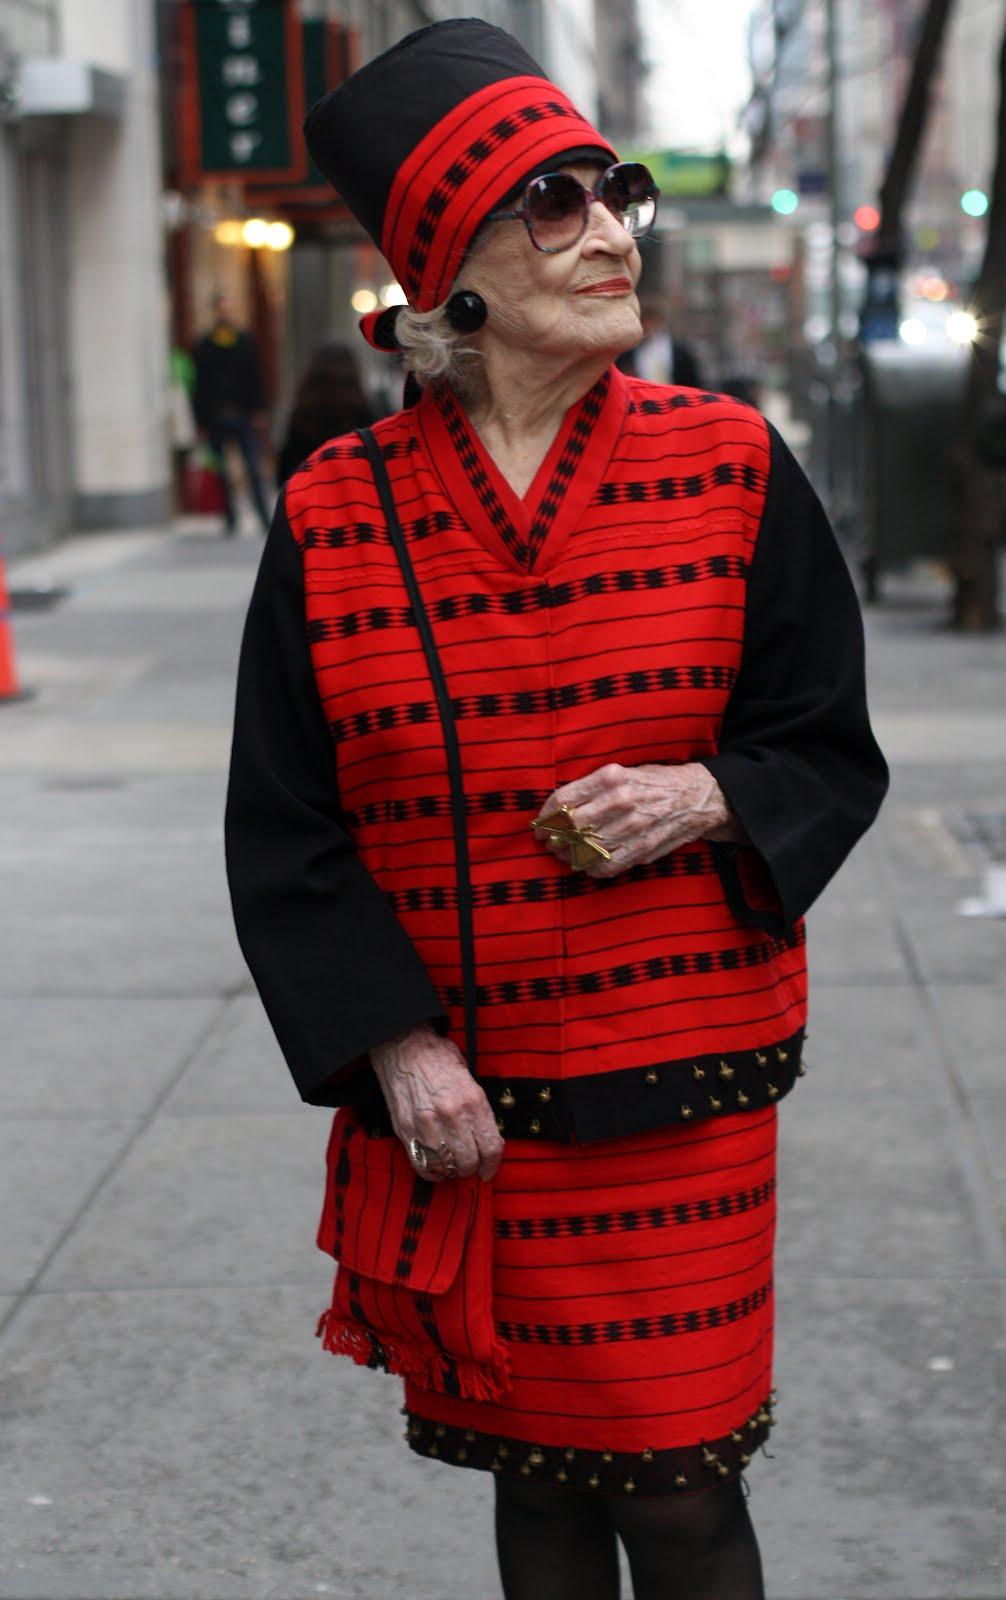 Zelda Kaplan's Nightclub Outfit